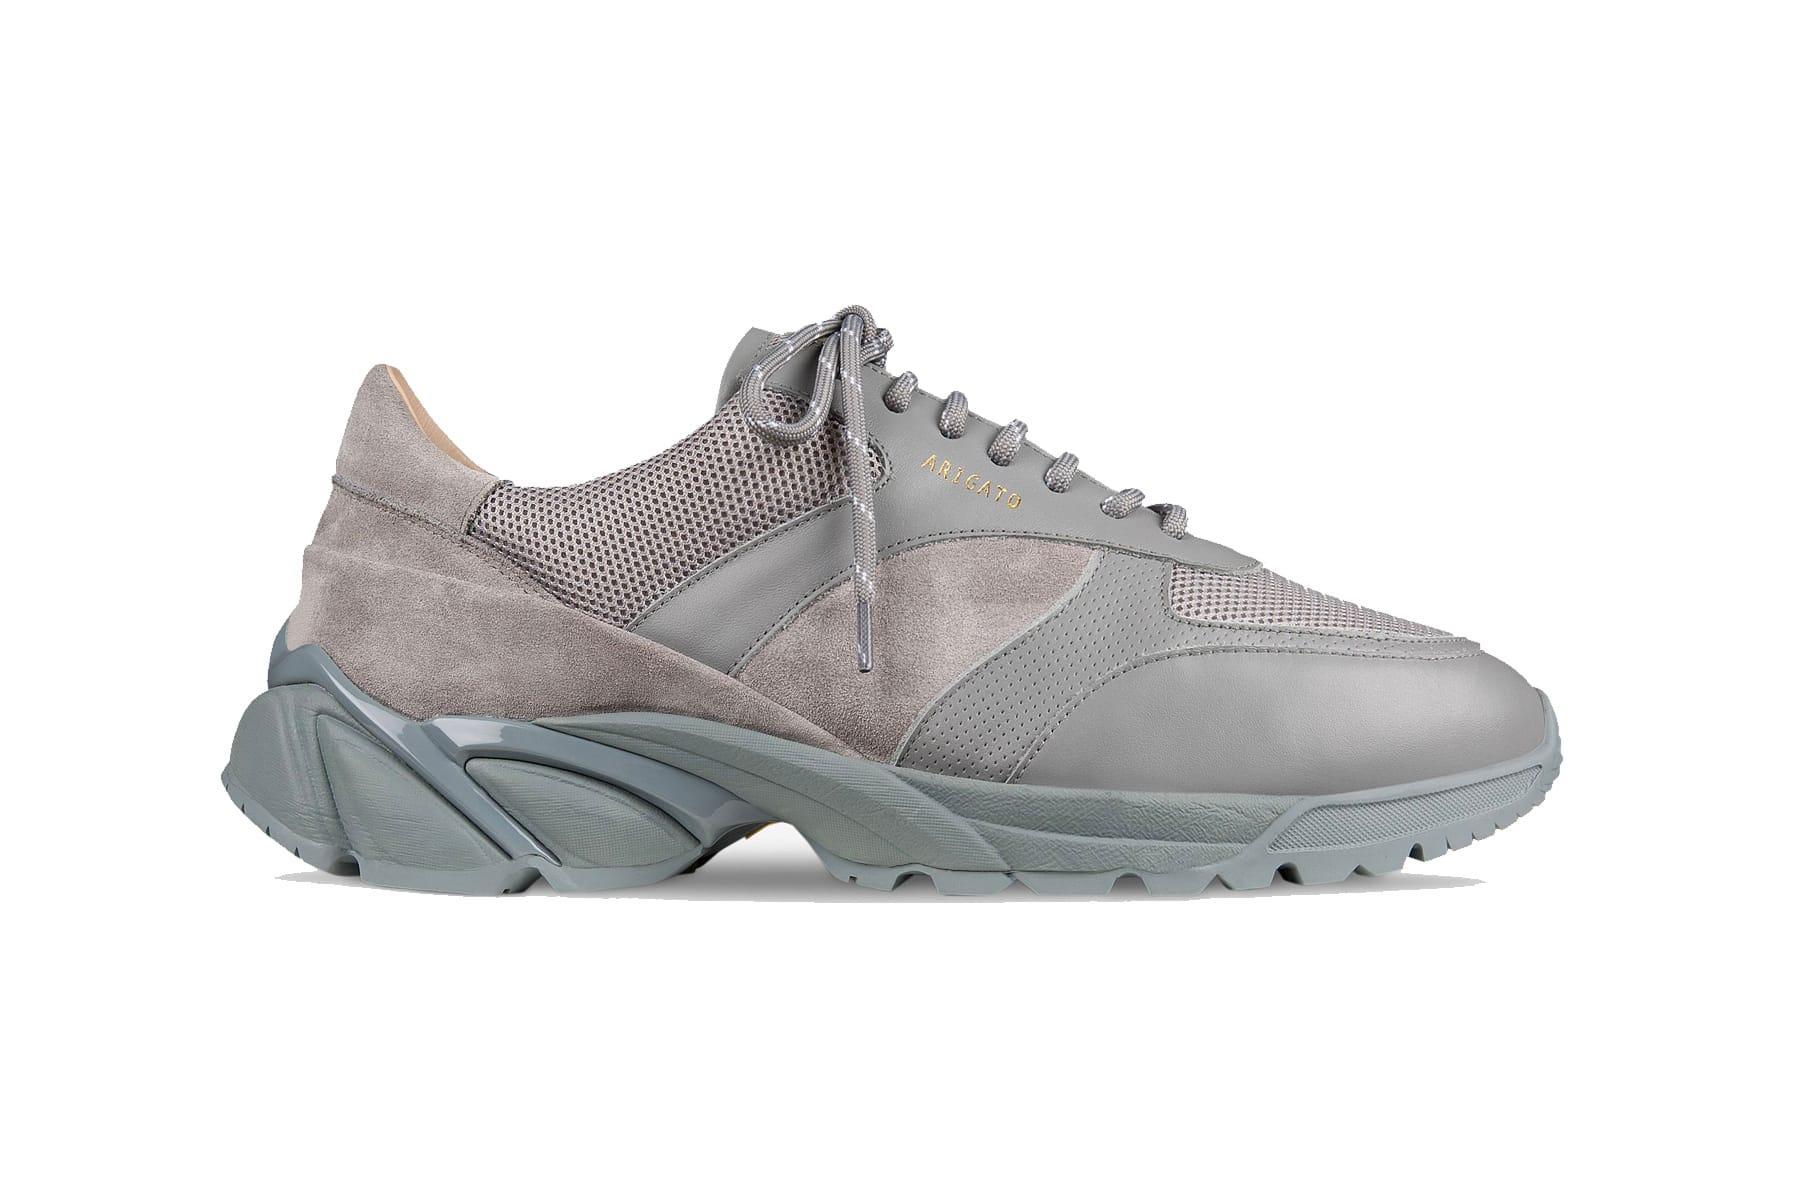 best dad sneakers for women